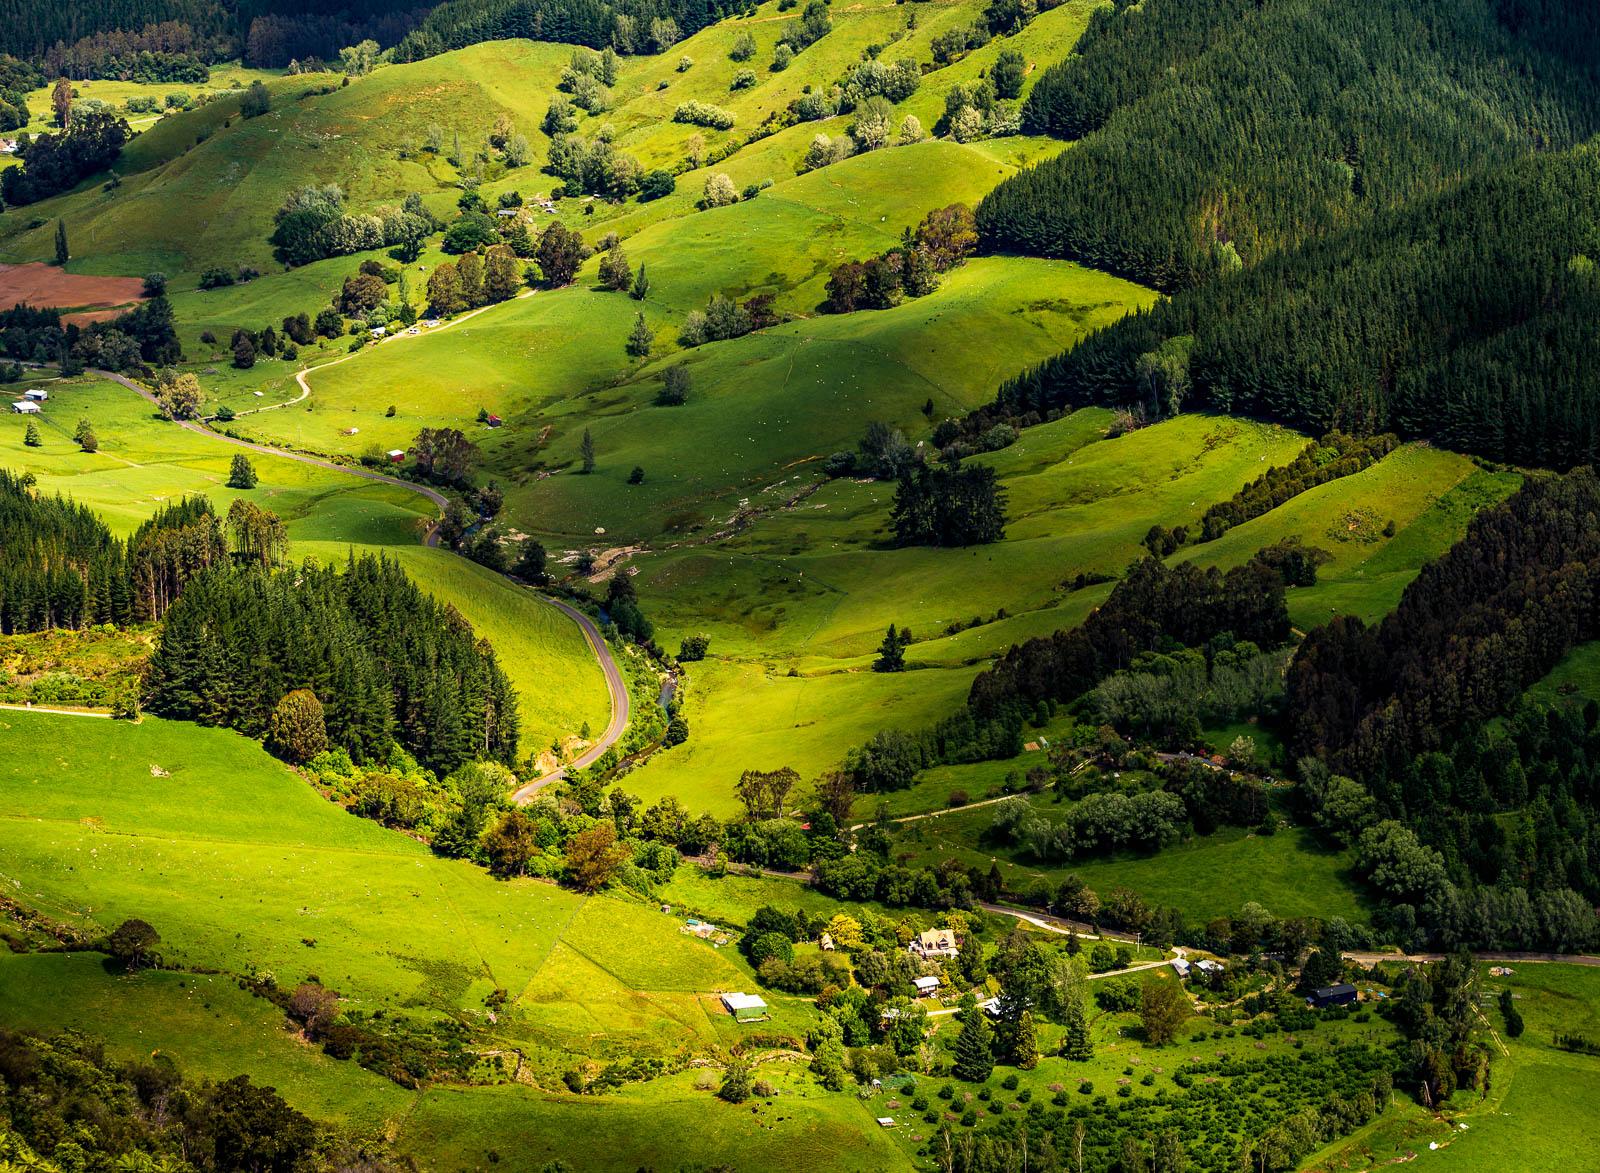 Lower Takaka Hill Valley